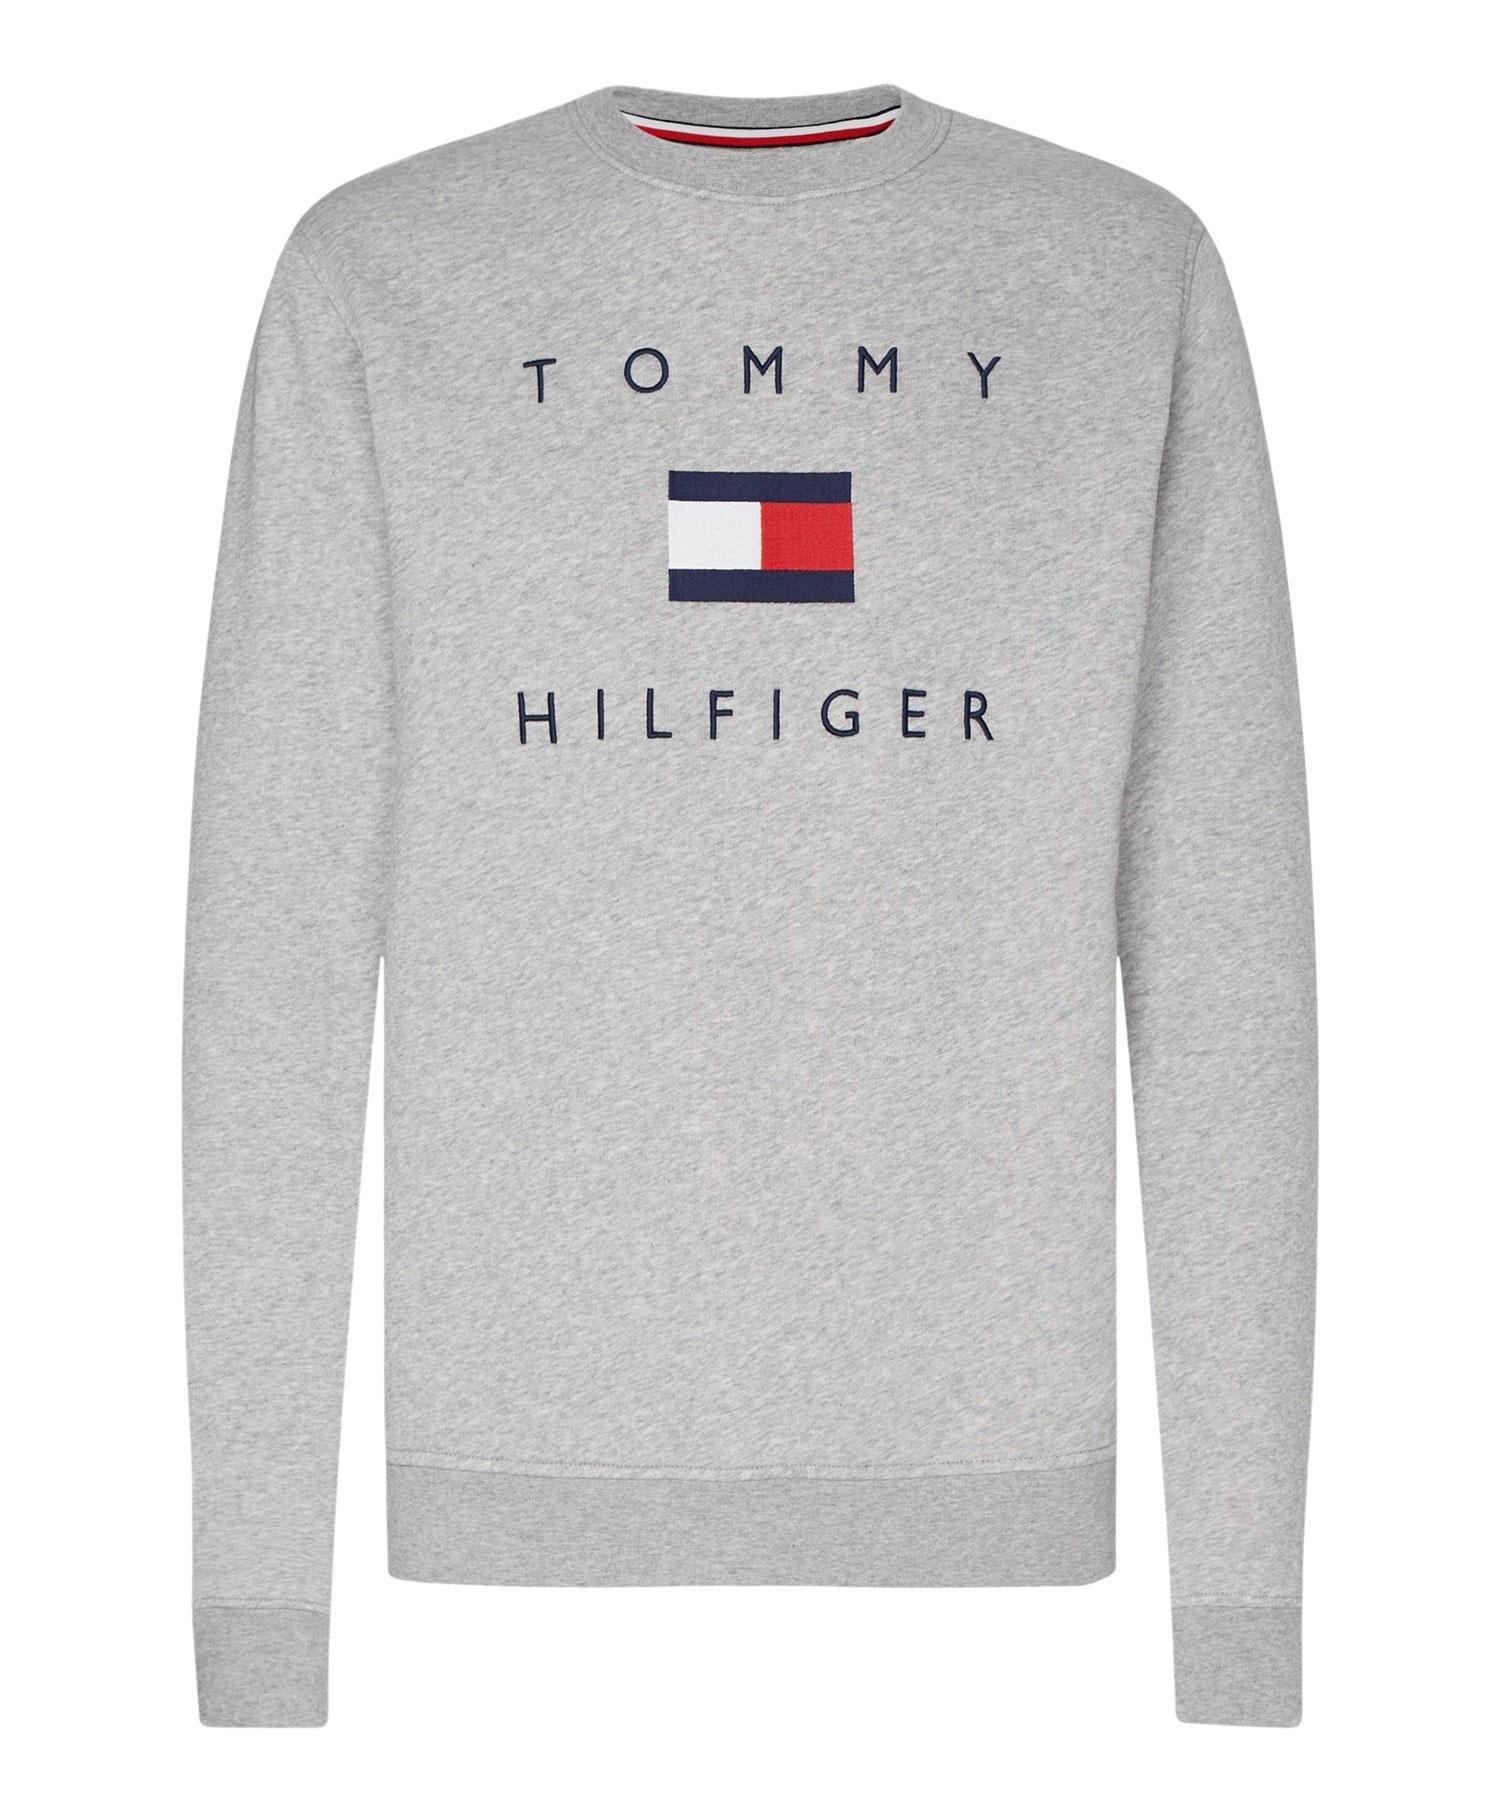 Tommy Hilfiger flag sweat